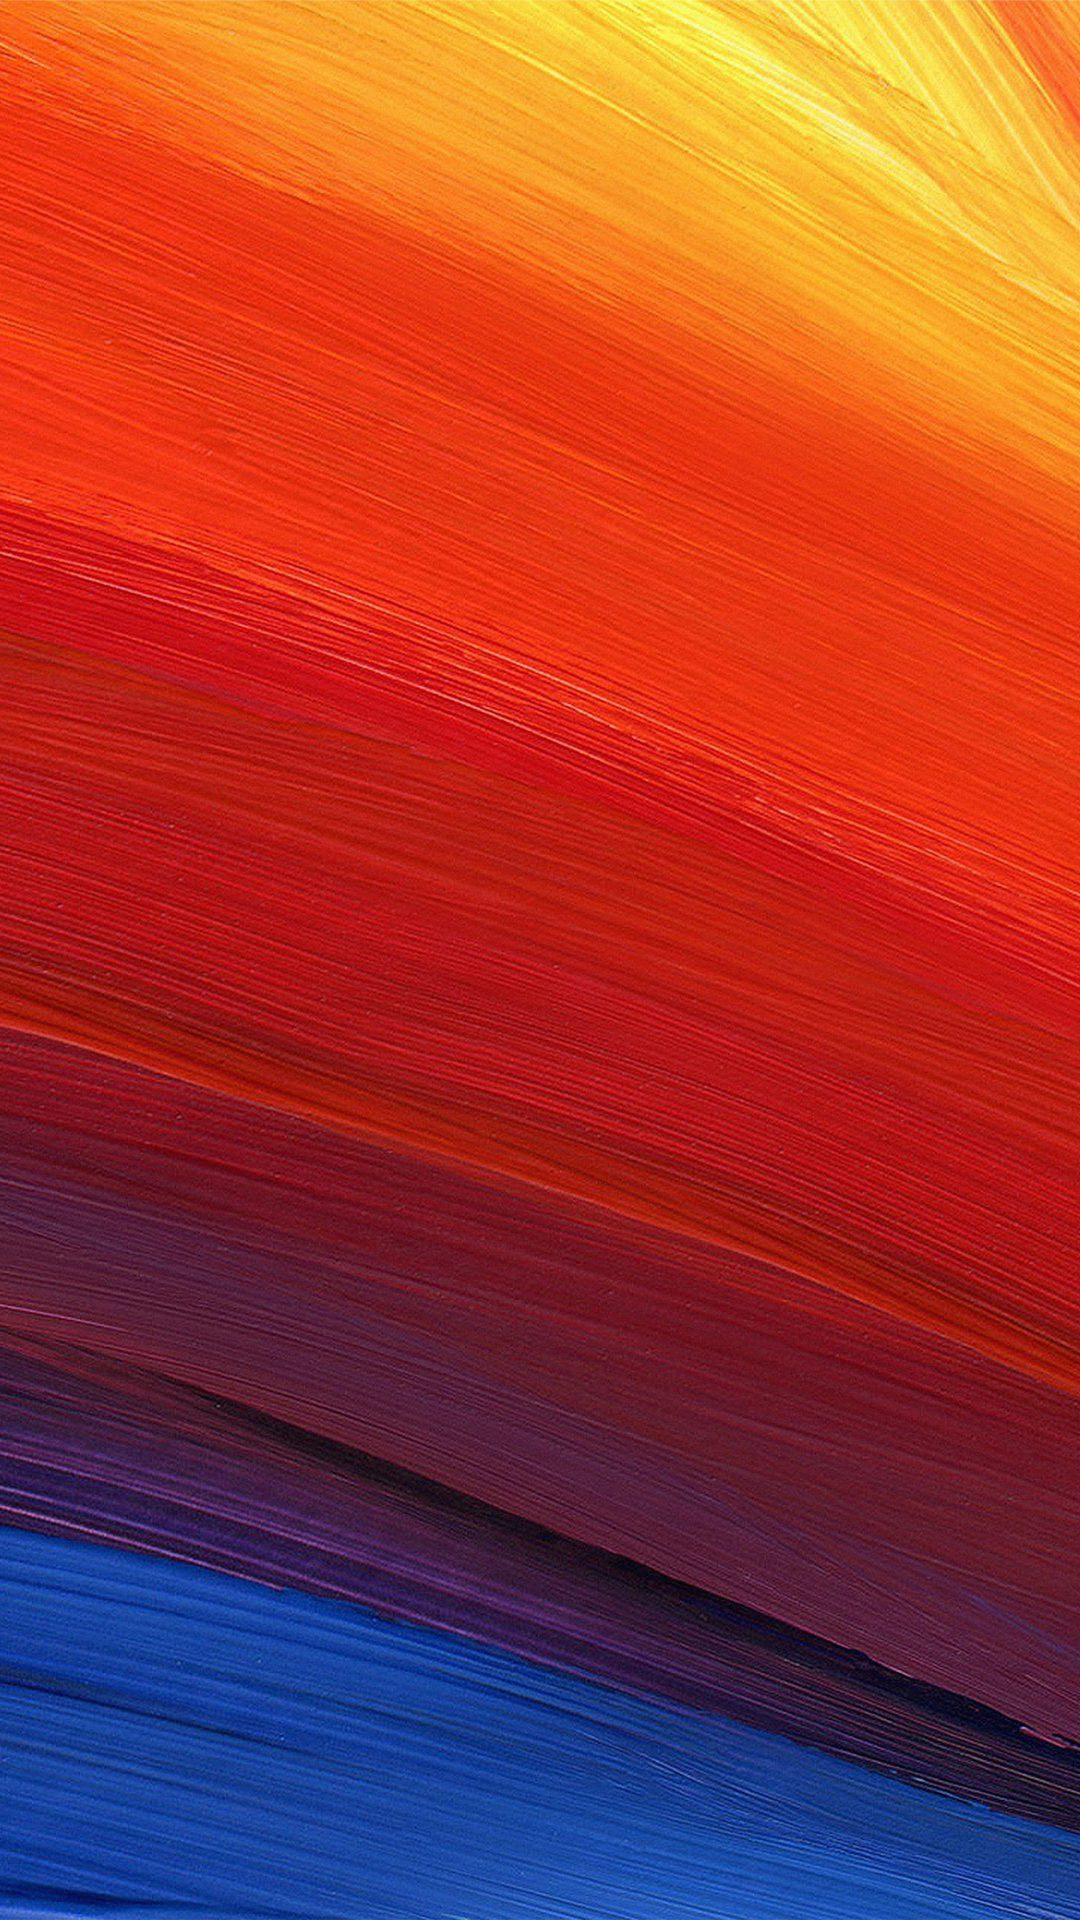 Rainbow Swirl Line Abstract Pattern